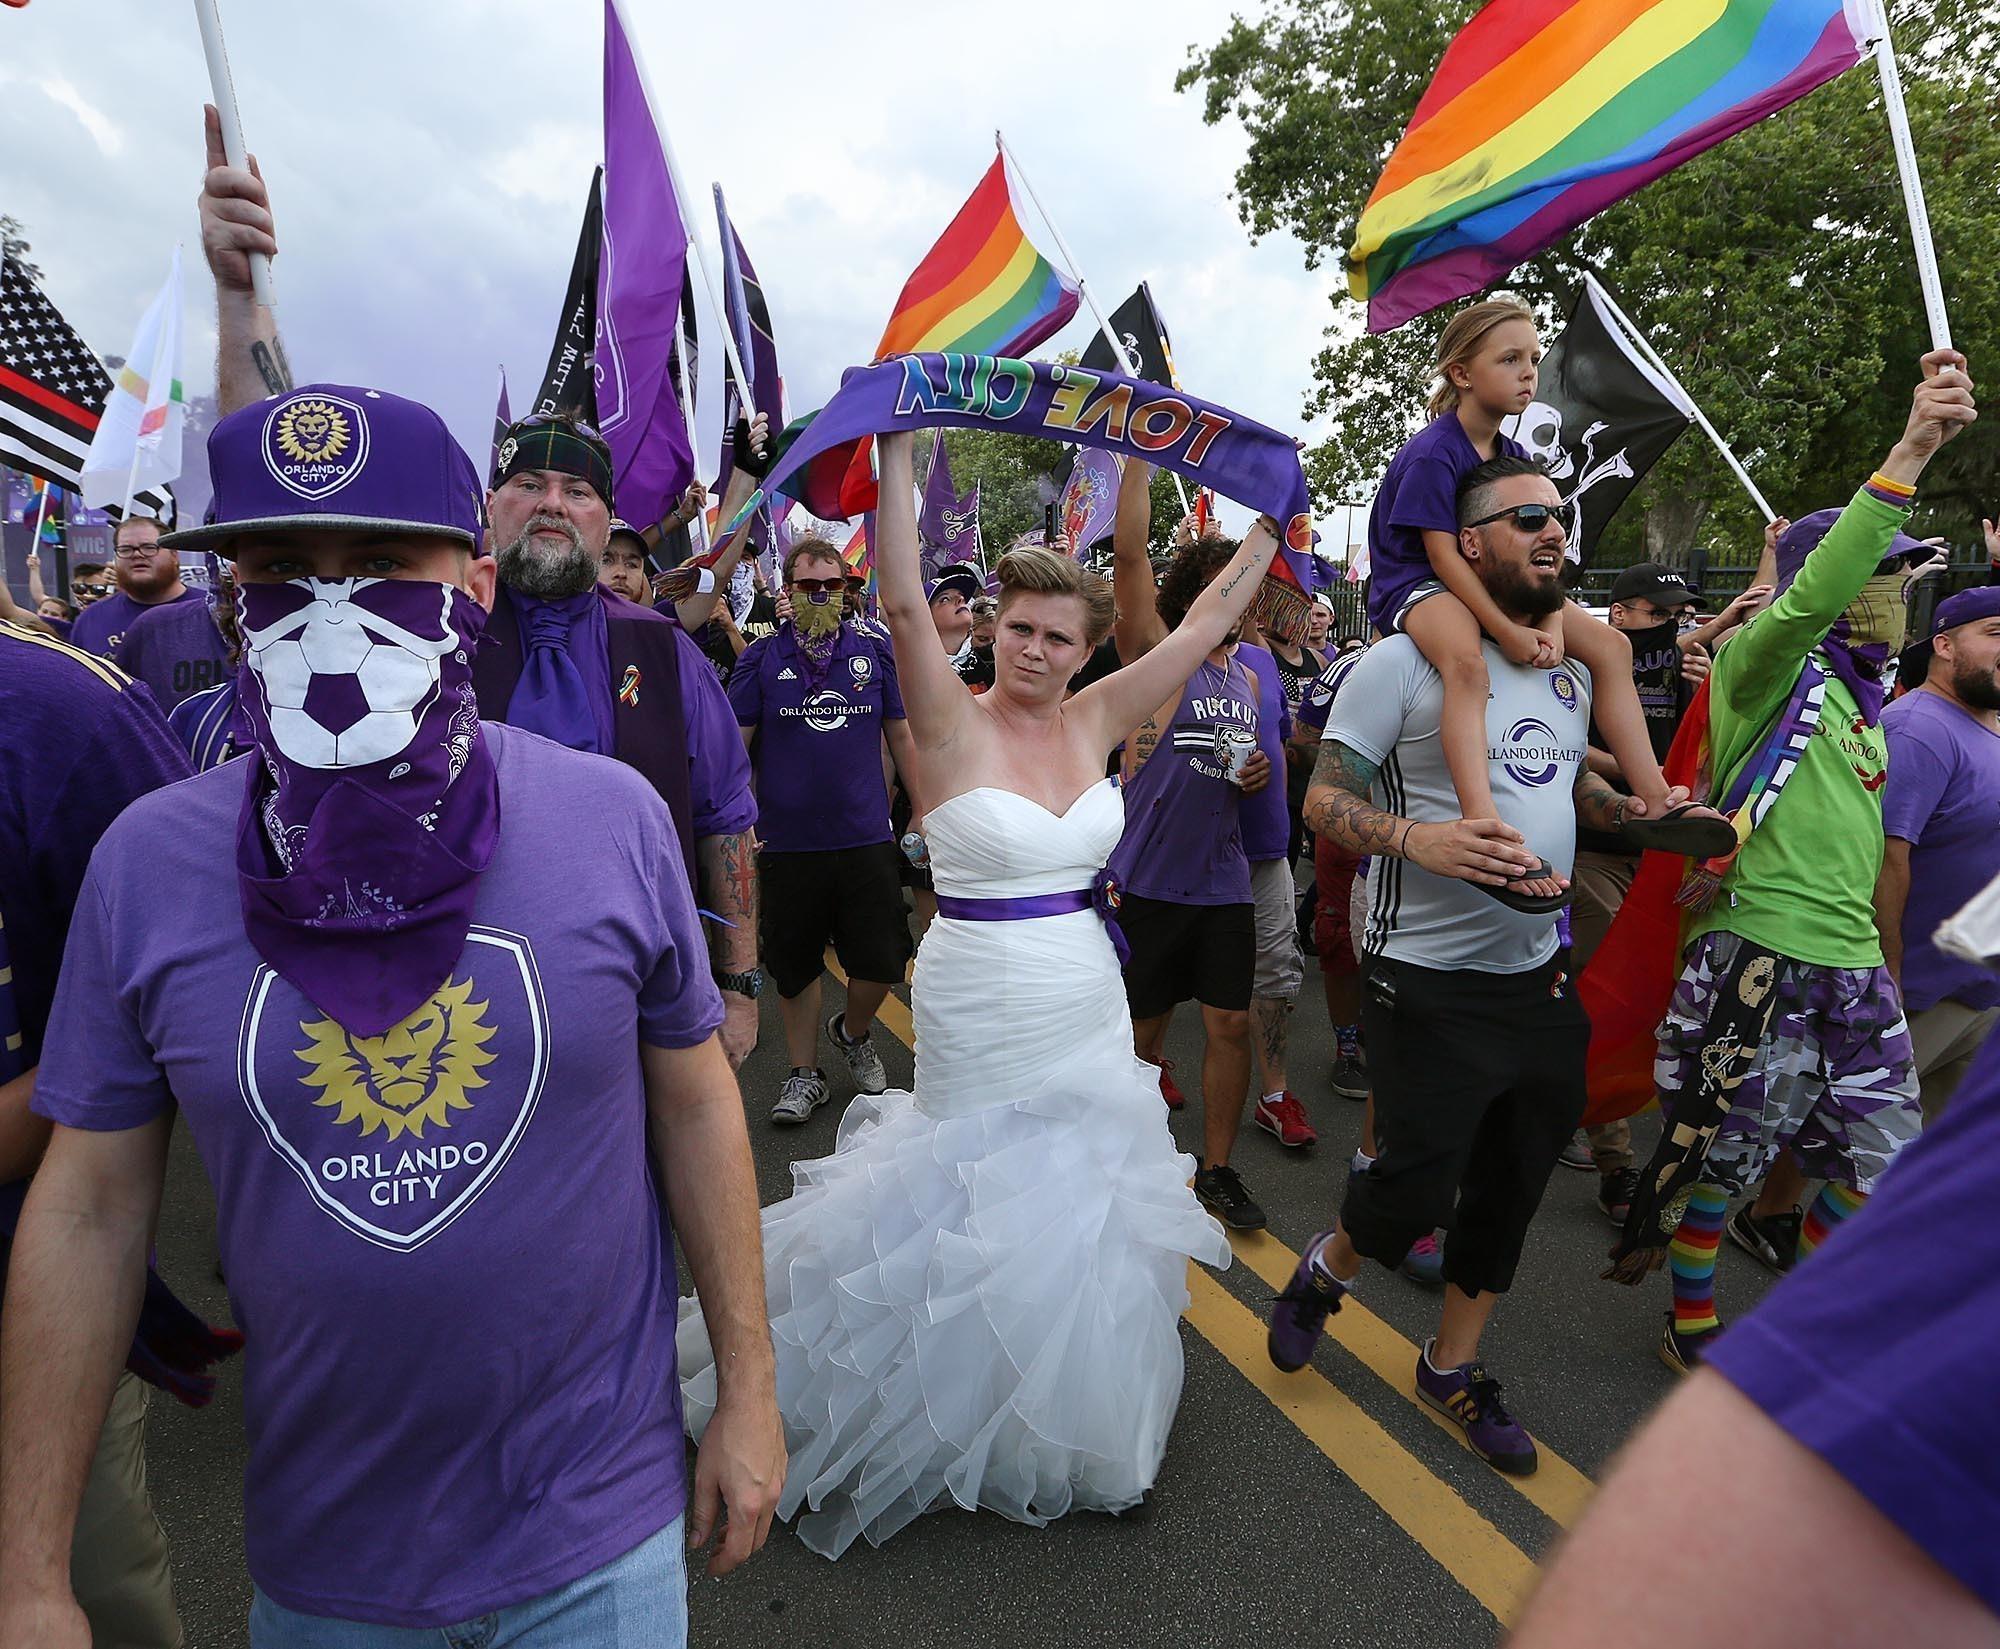 Orlando Wedding Bands 73 Spectacular Orlando City fans get